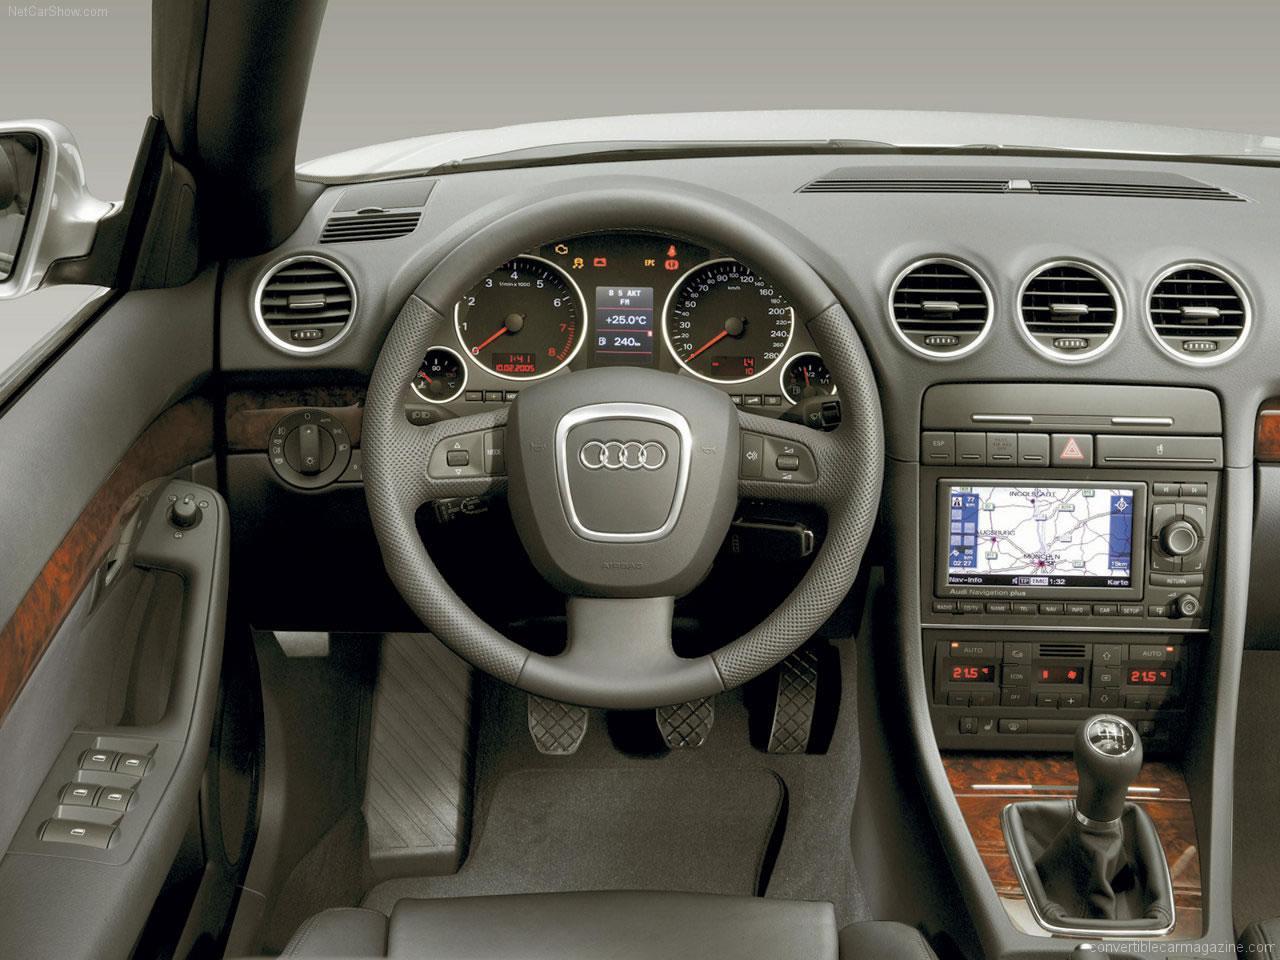 Audi A4 III (B7) 2004 - 2008 Cabriolet #2